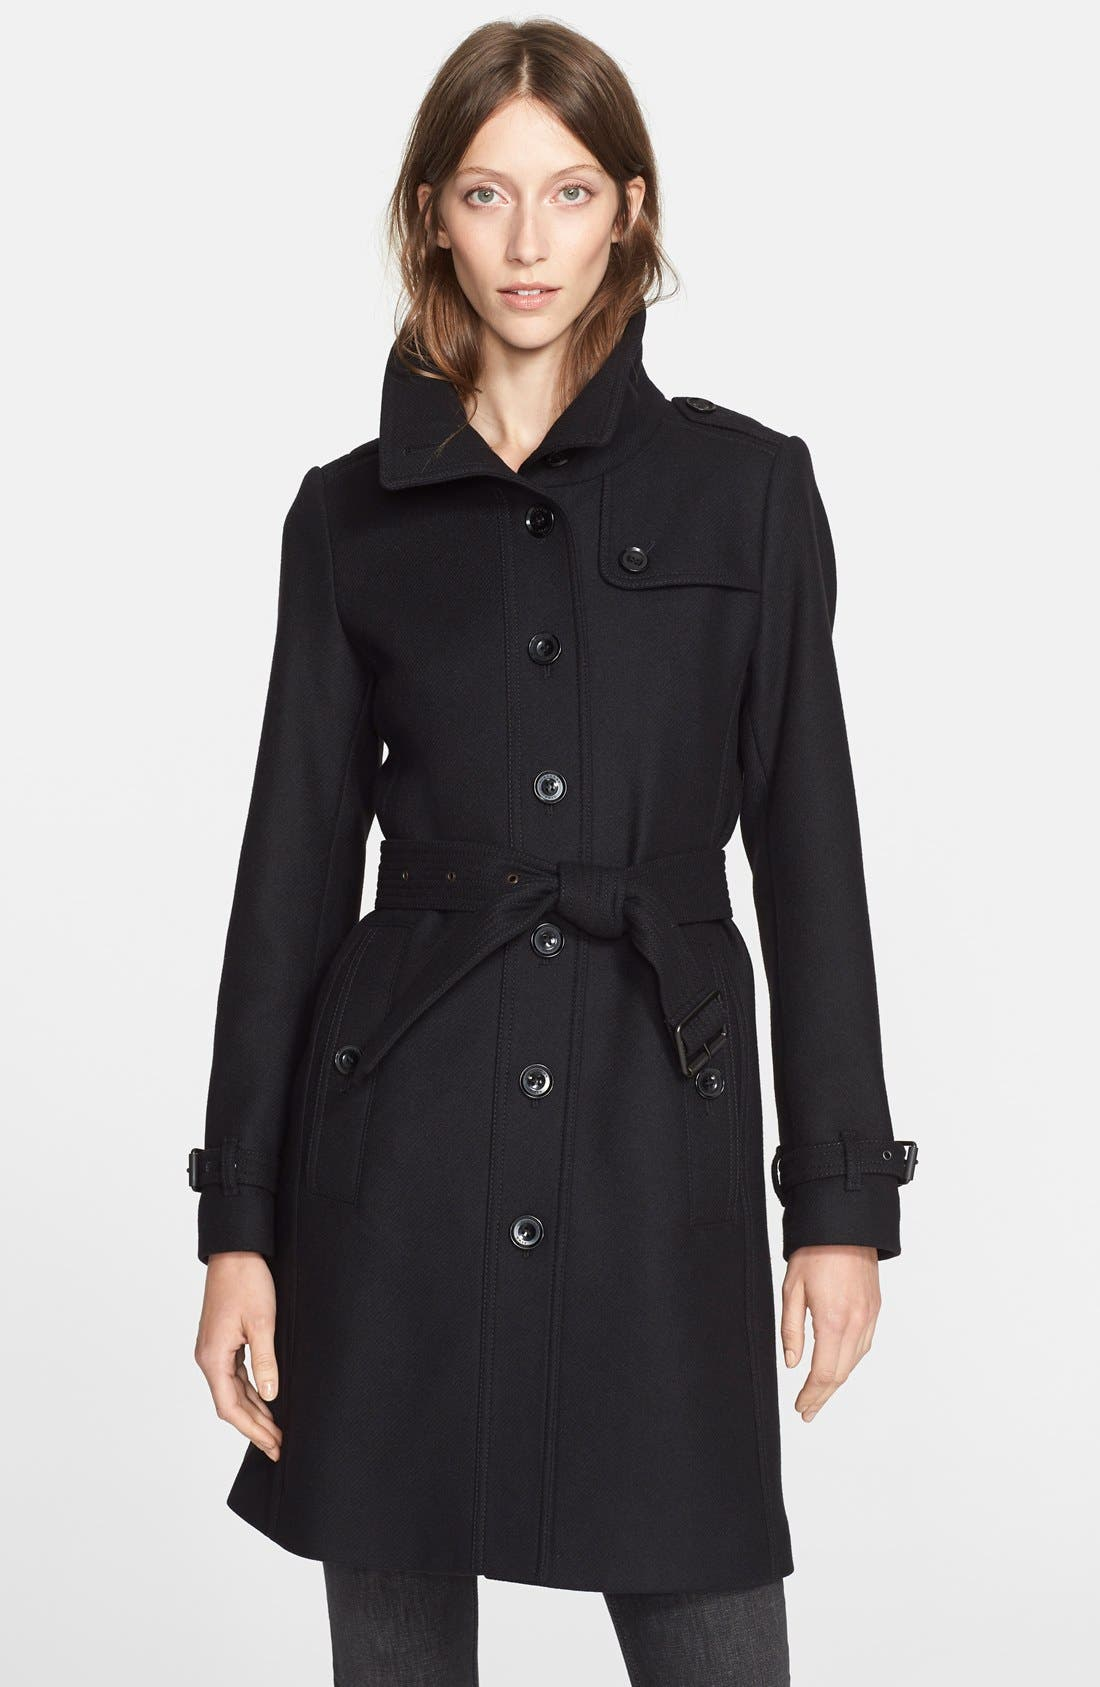 'Rushfield' Wool Blend Single Breasted Coat,                             Main thumbnail 1, color,                             001